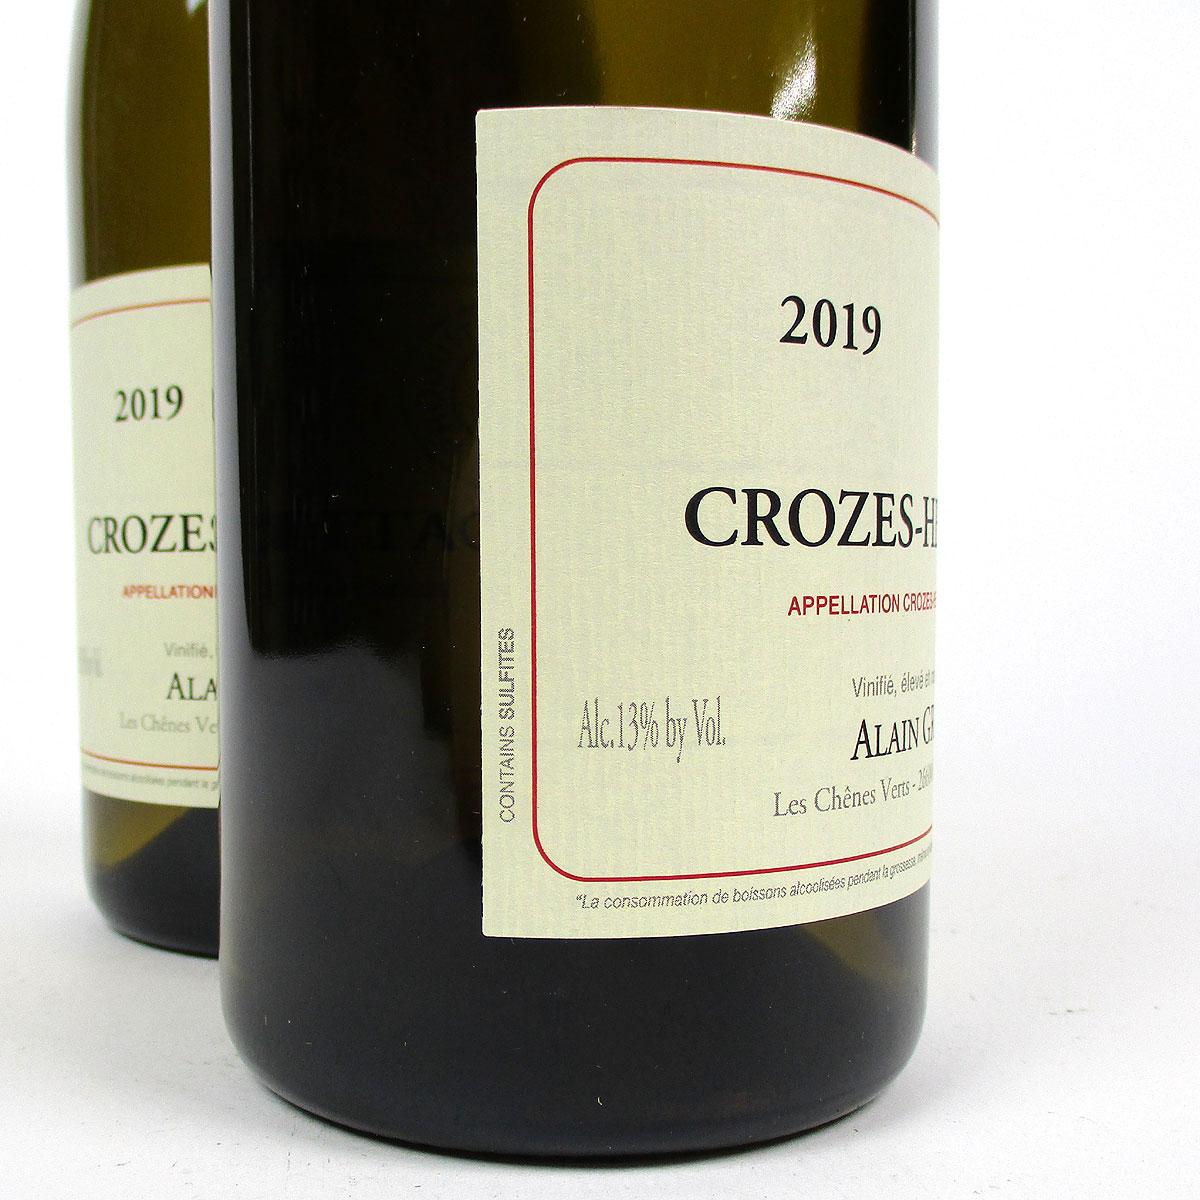 Crozes-Hermitage: Alain Graillot Blanc 2019 - Bottle Side Label